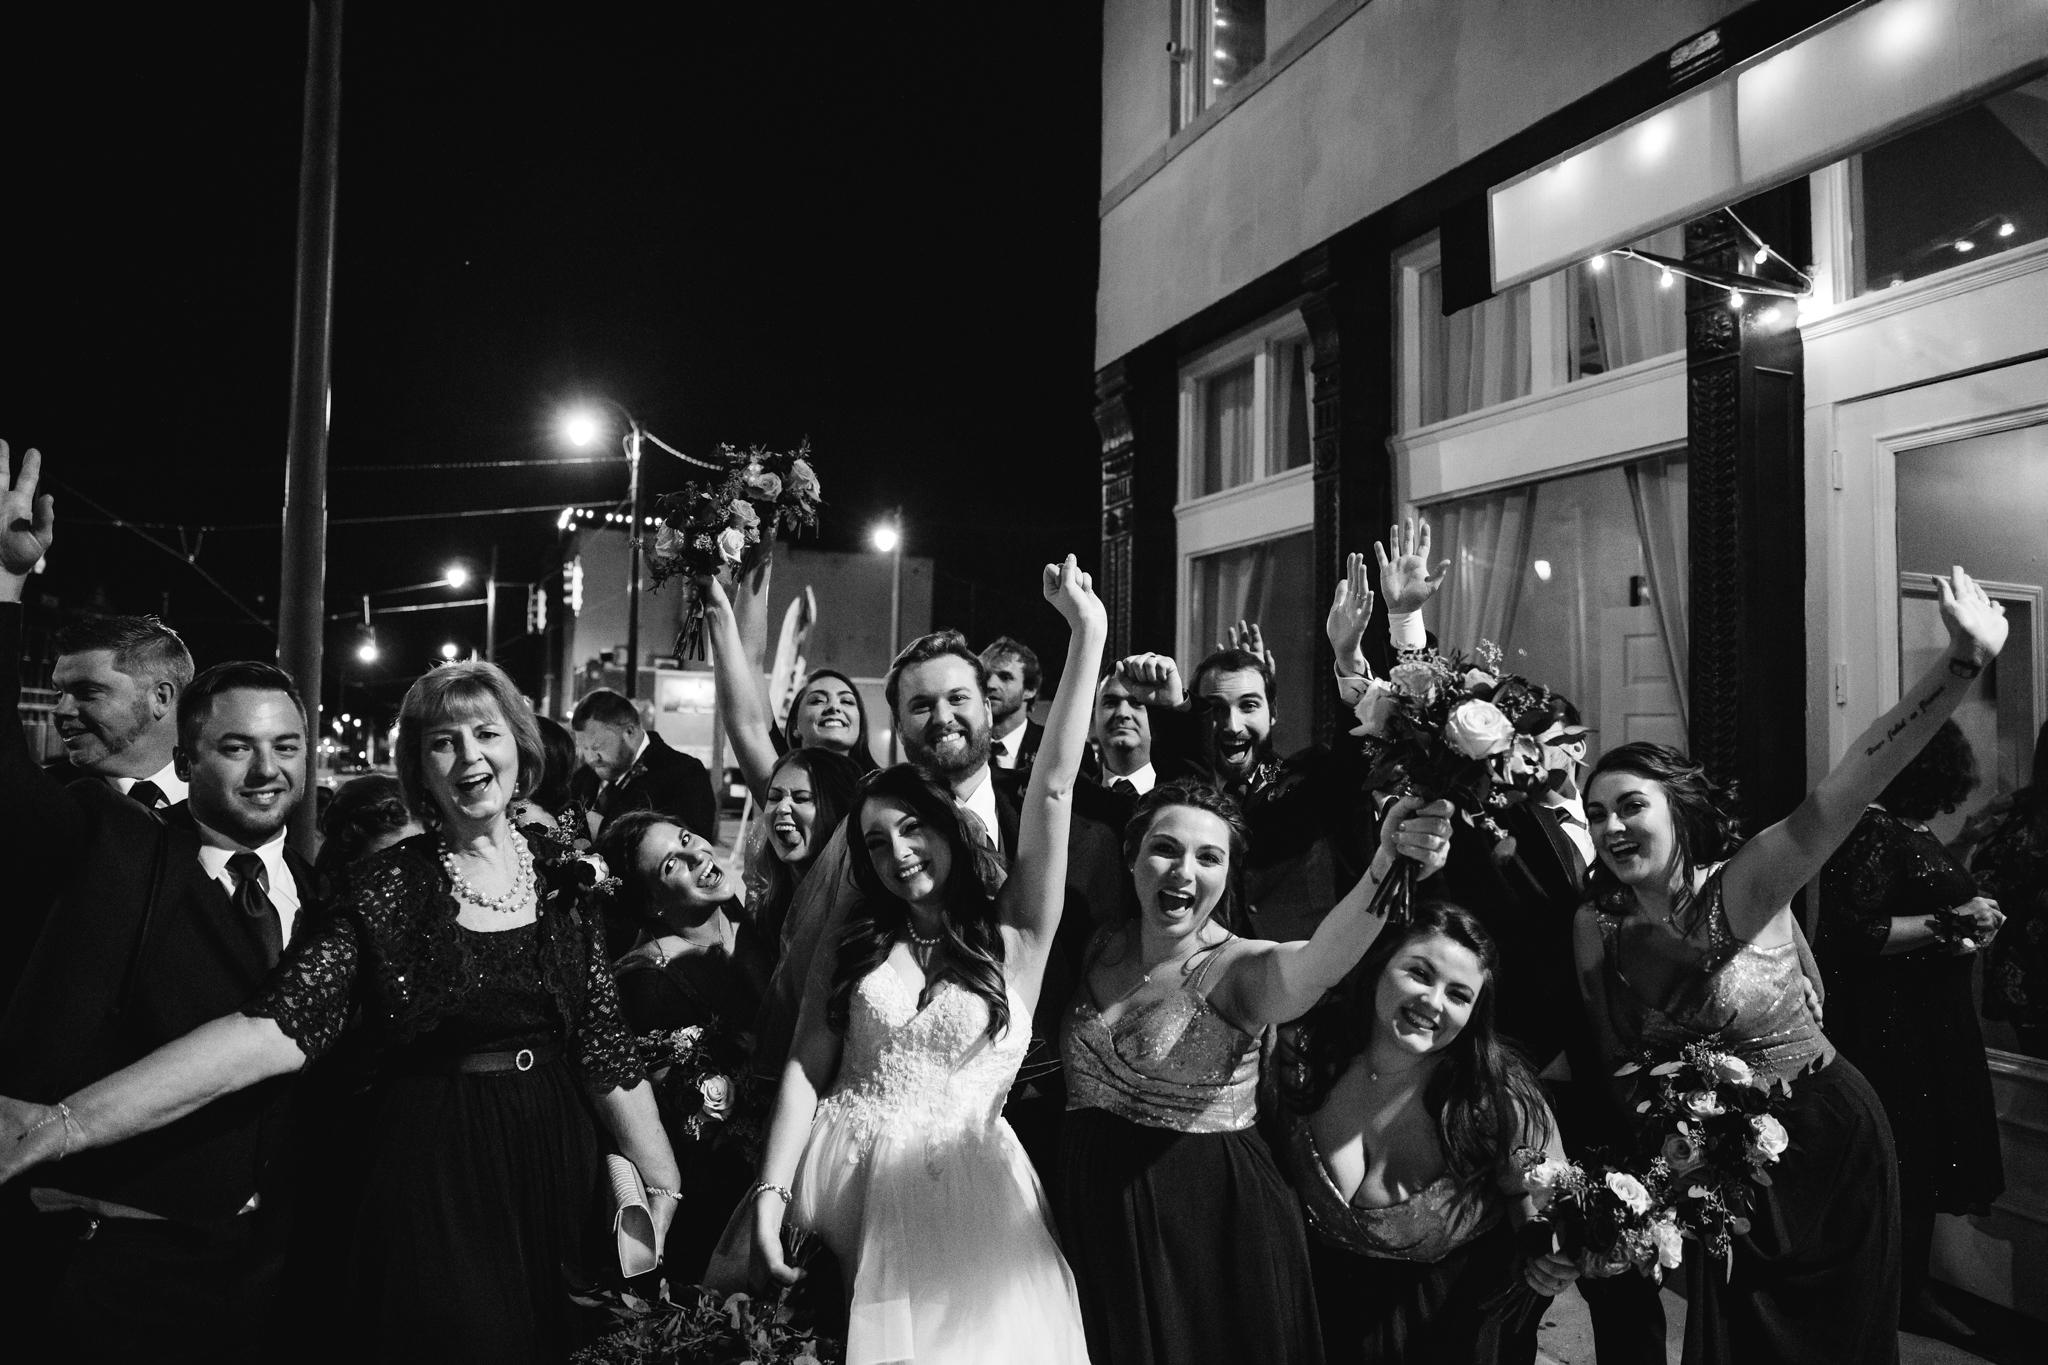 memphis-wedding-photographers-thewarmtharoundyou-ballinese-ballroom (172 of 232).jpg